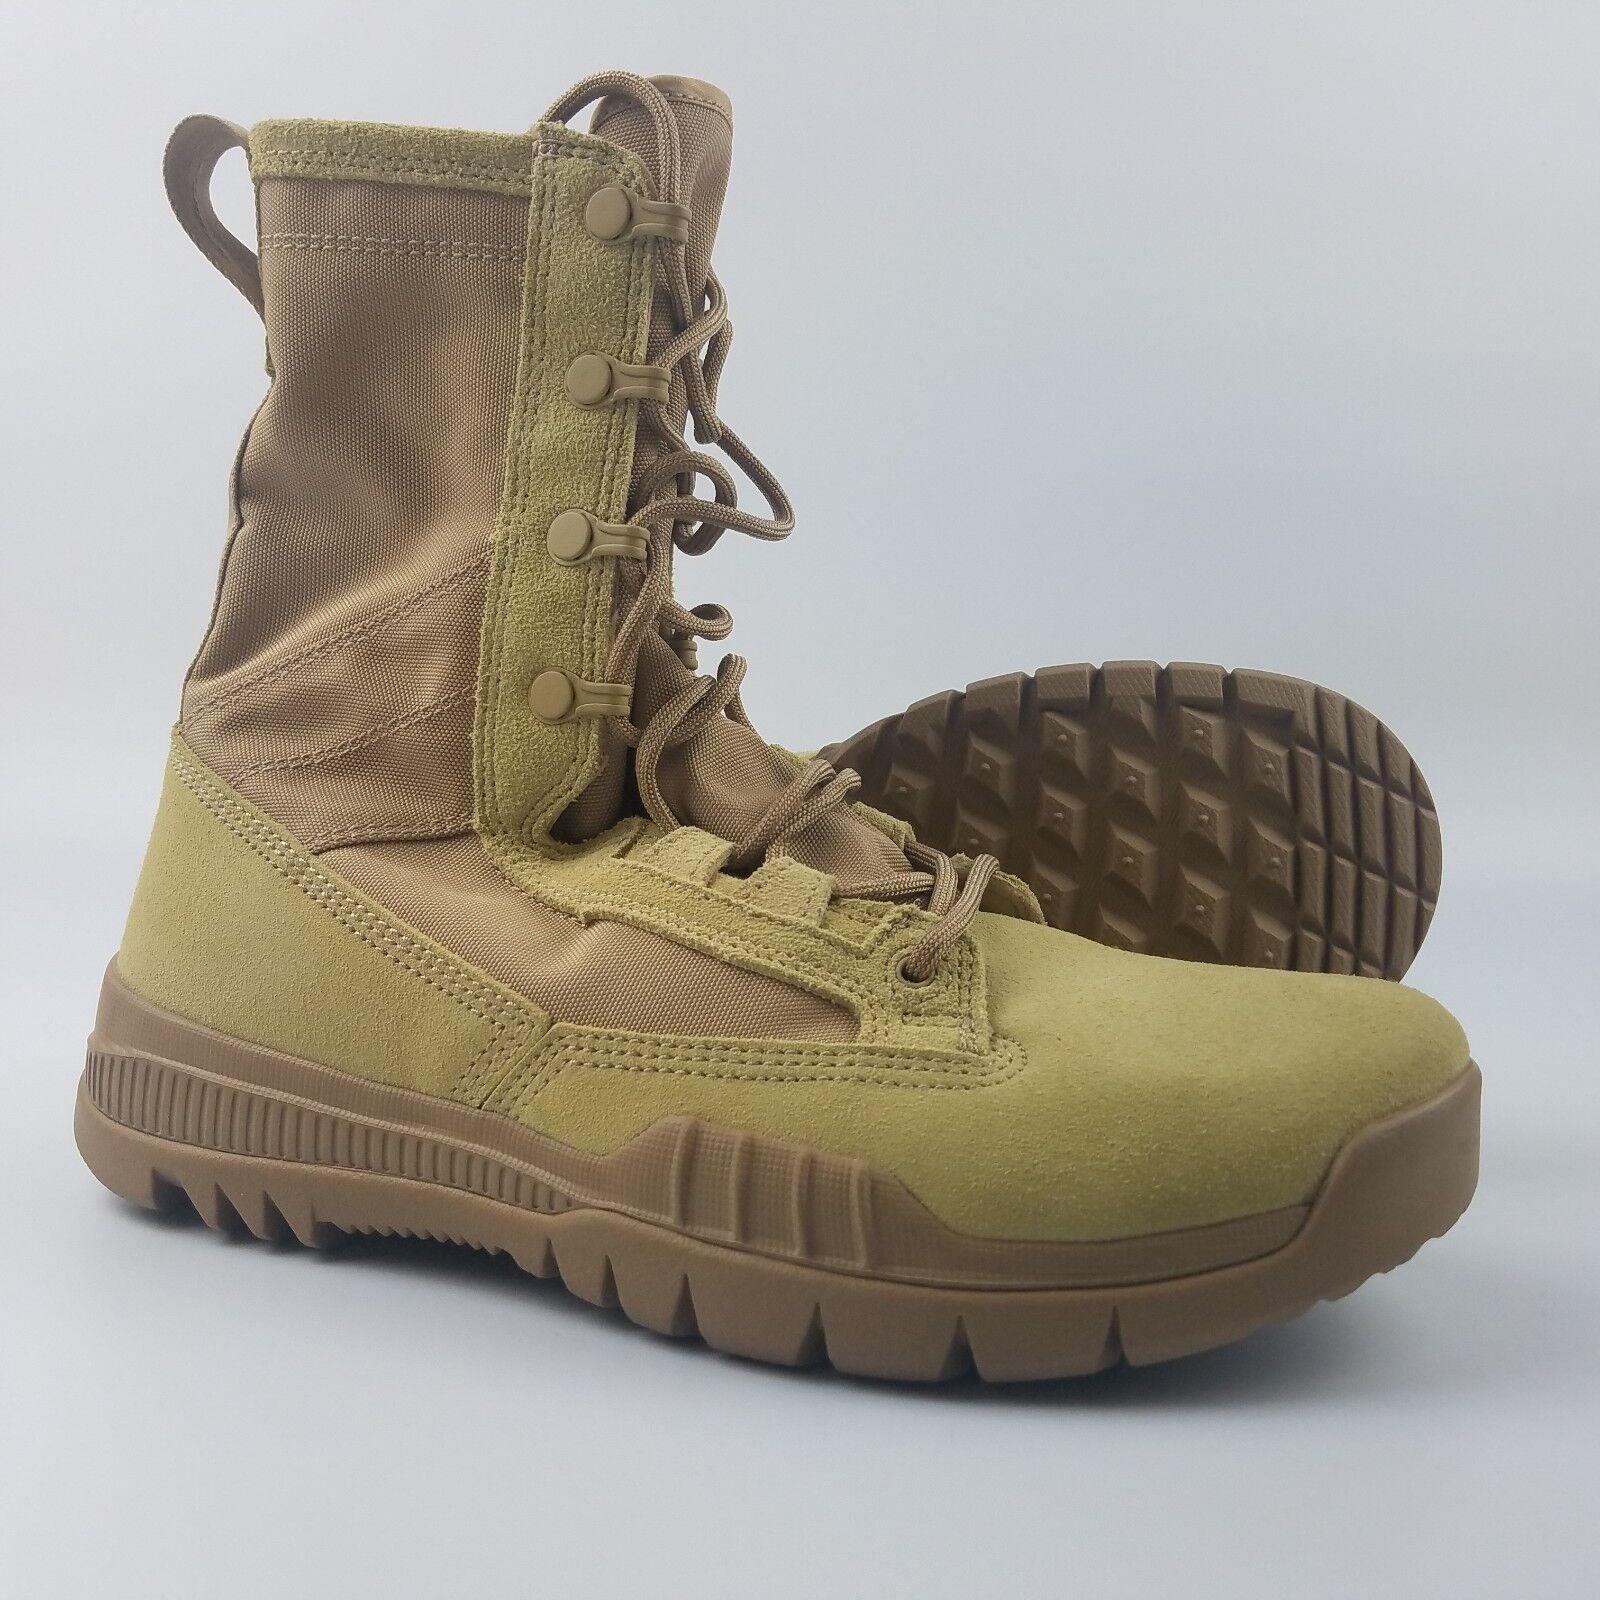 Nike SFB Field 8  Leather Boots Mens Size 6 British Khaki Tan 688974-200